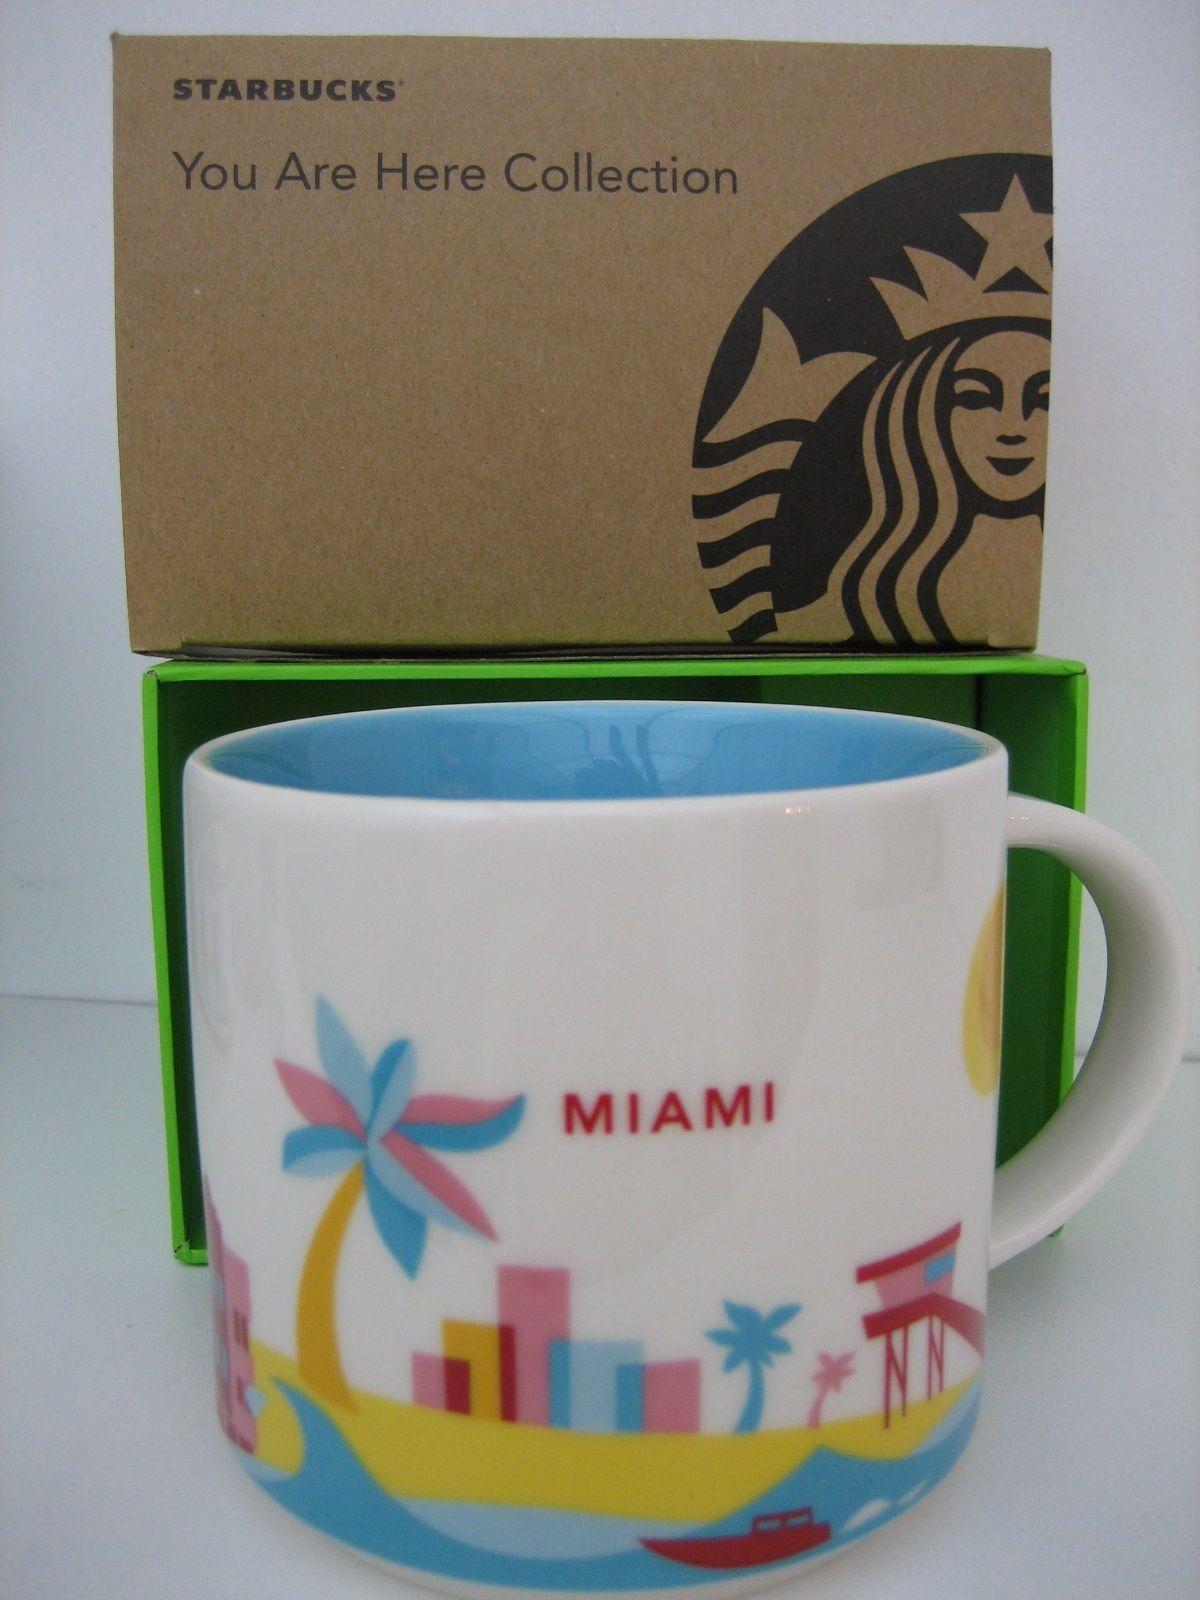 Starbucks Arizona Ceramic Mug 14 fl oz You Are Here Collection YAH